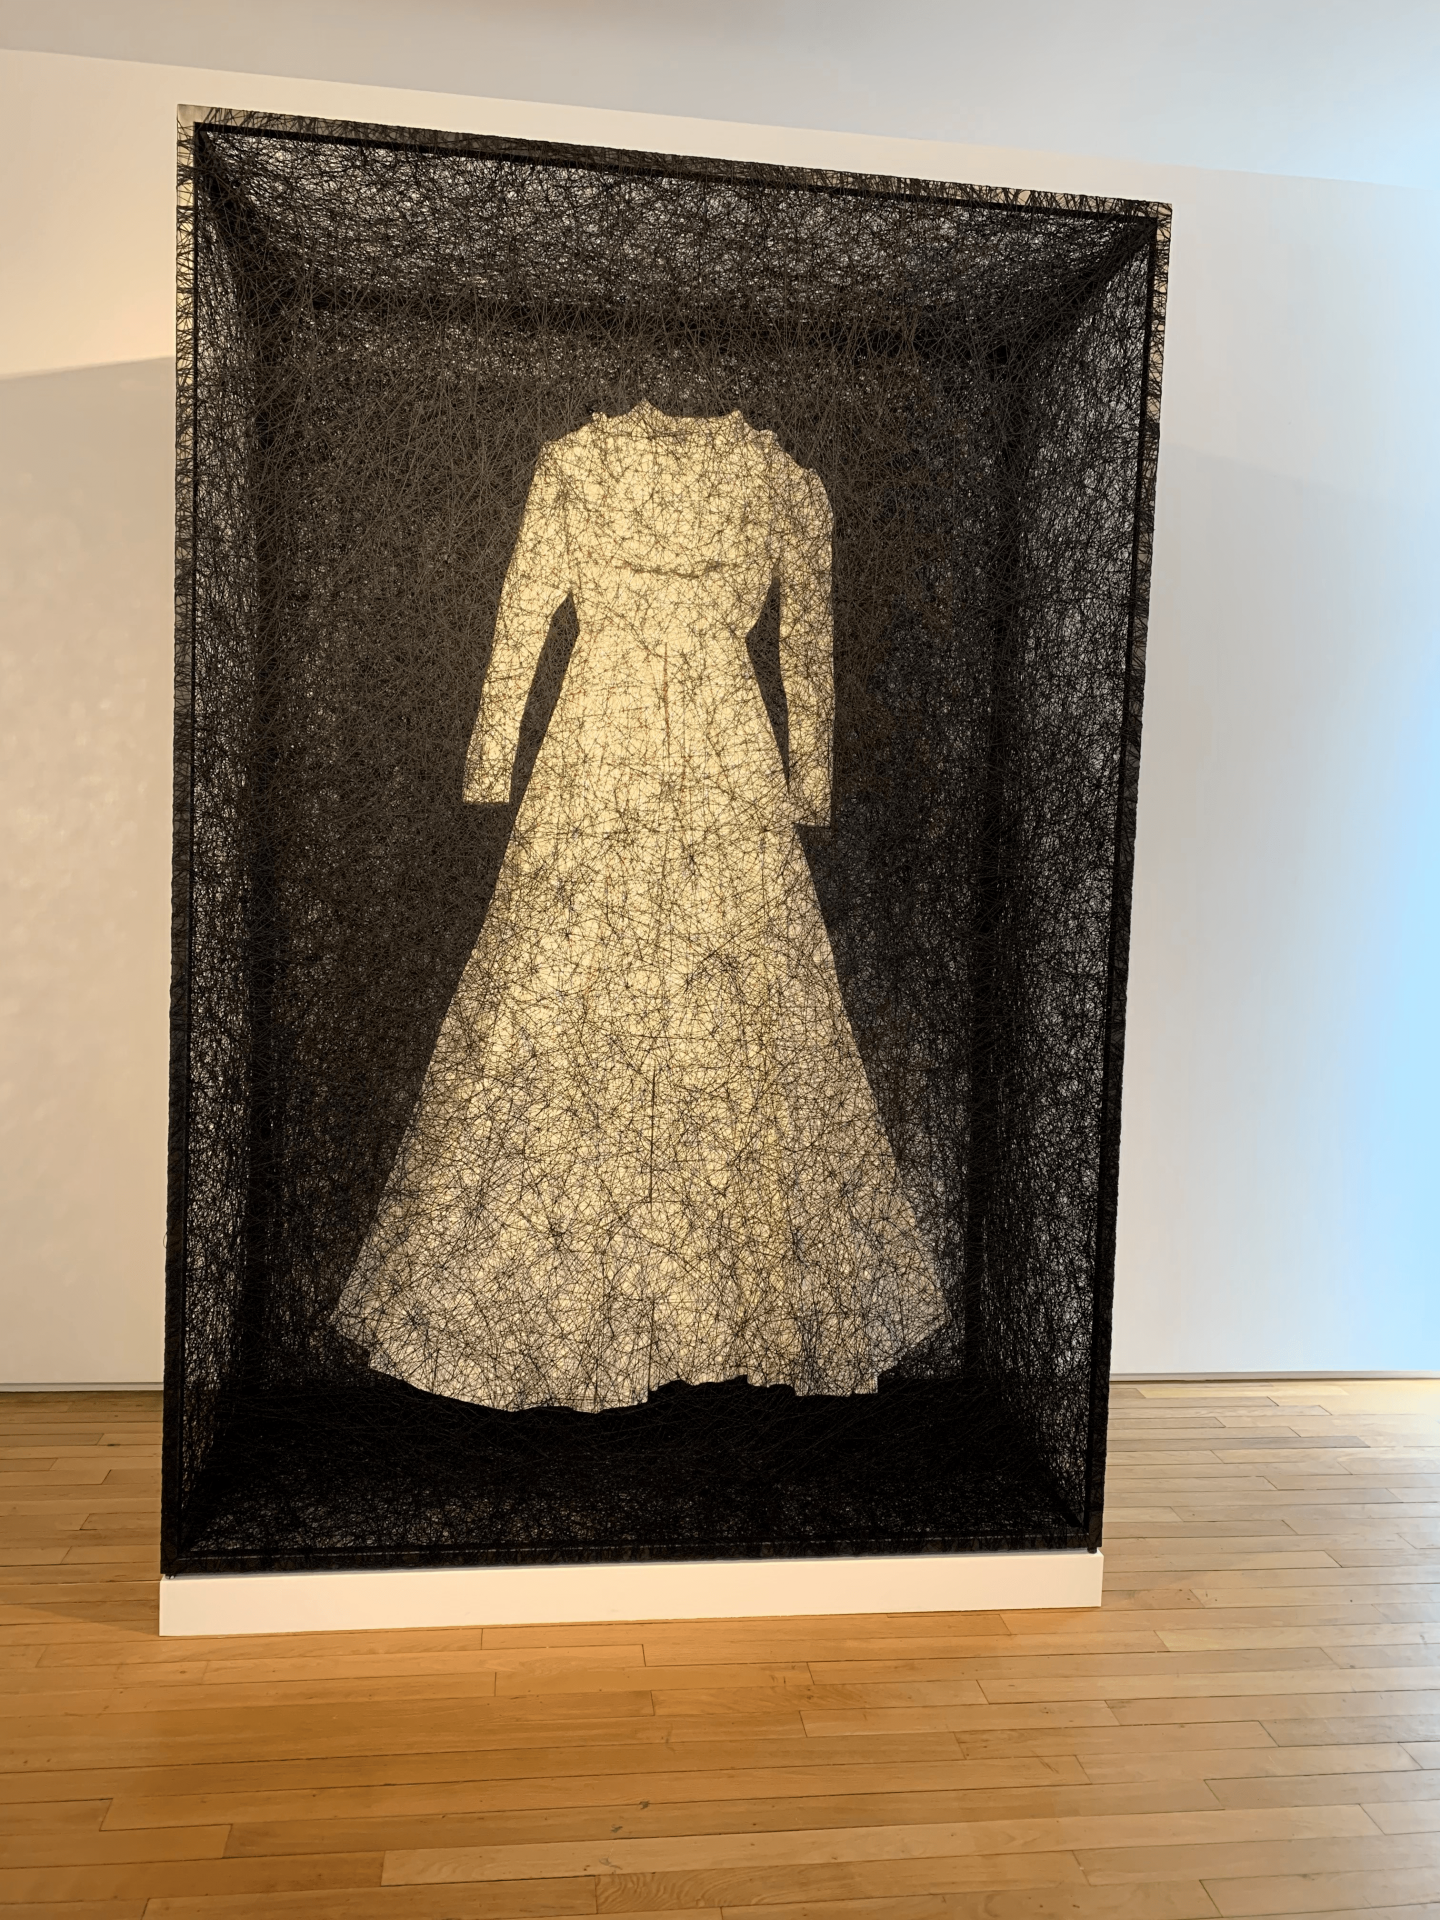 Japanese artist Chiharu Shiota at Templon Gallery Paris